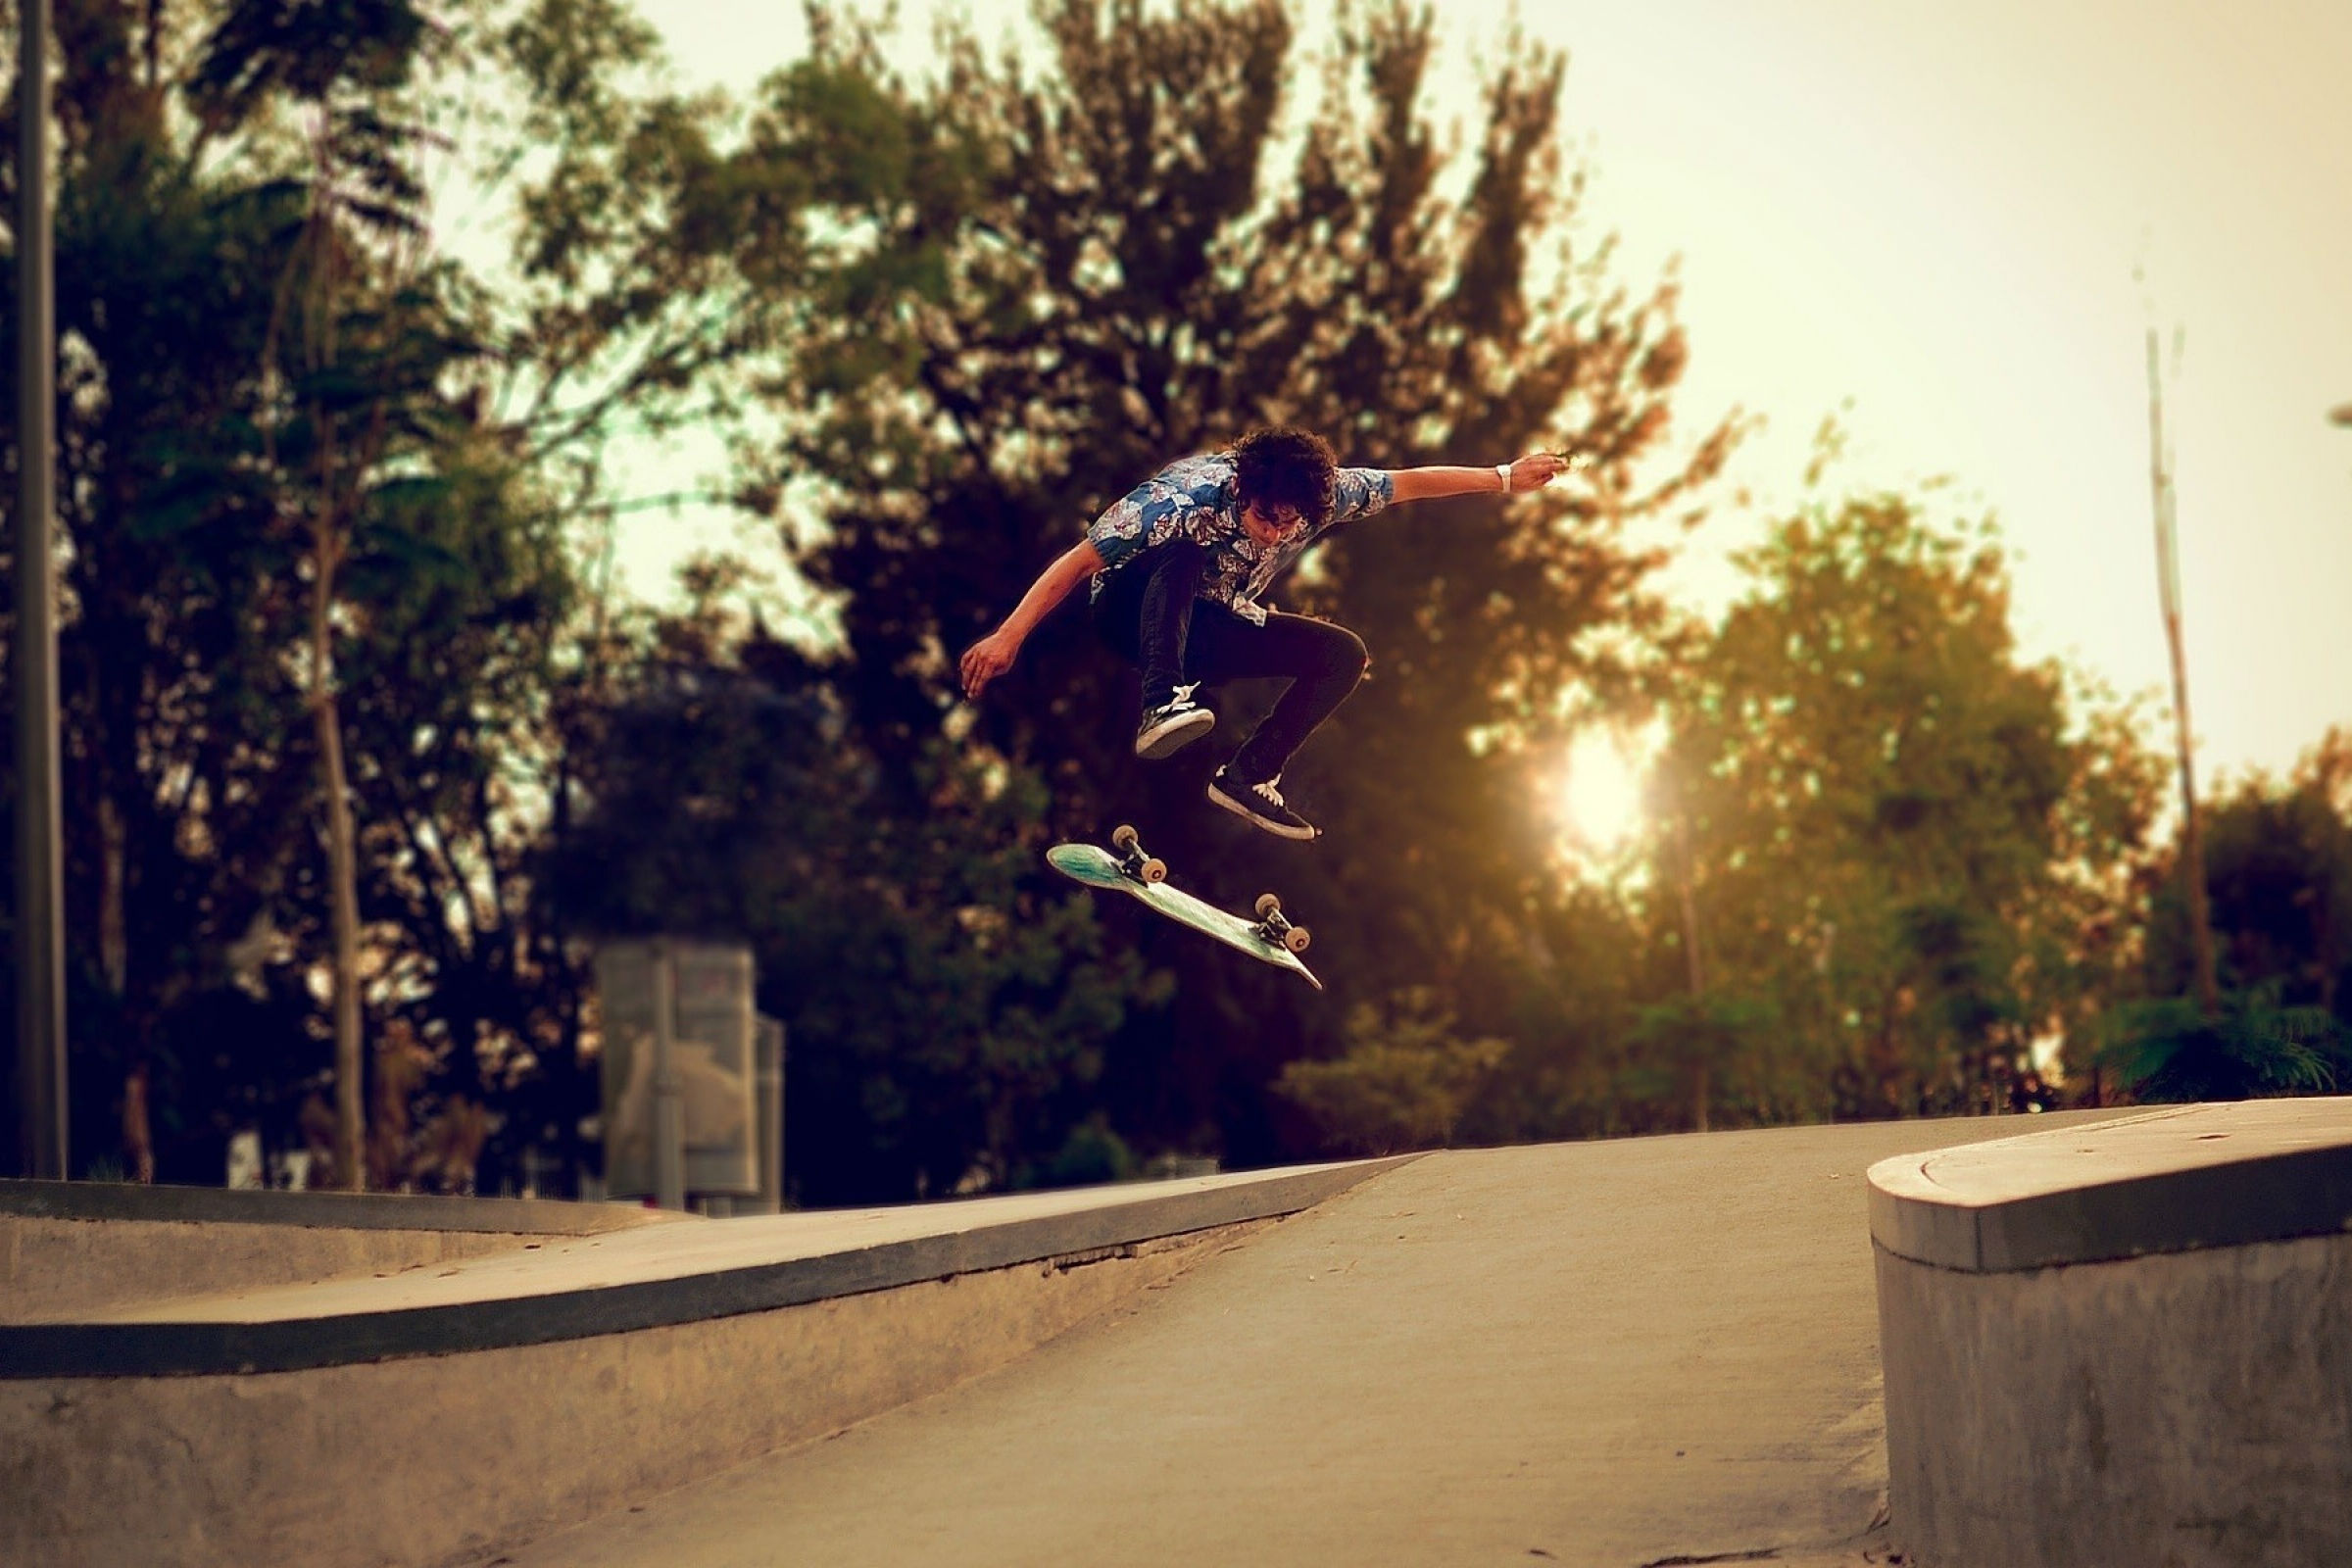 Фото: Скейт-парк